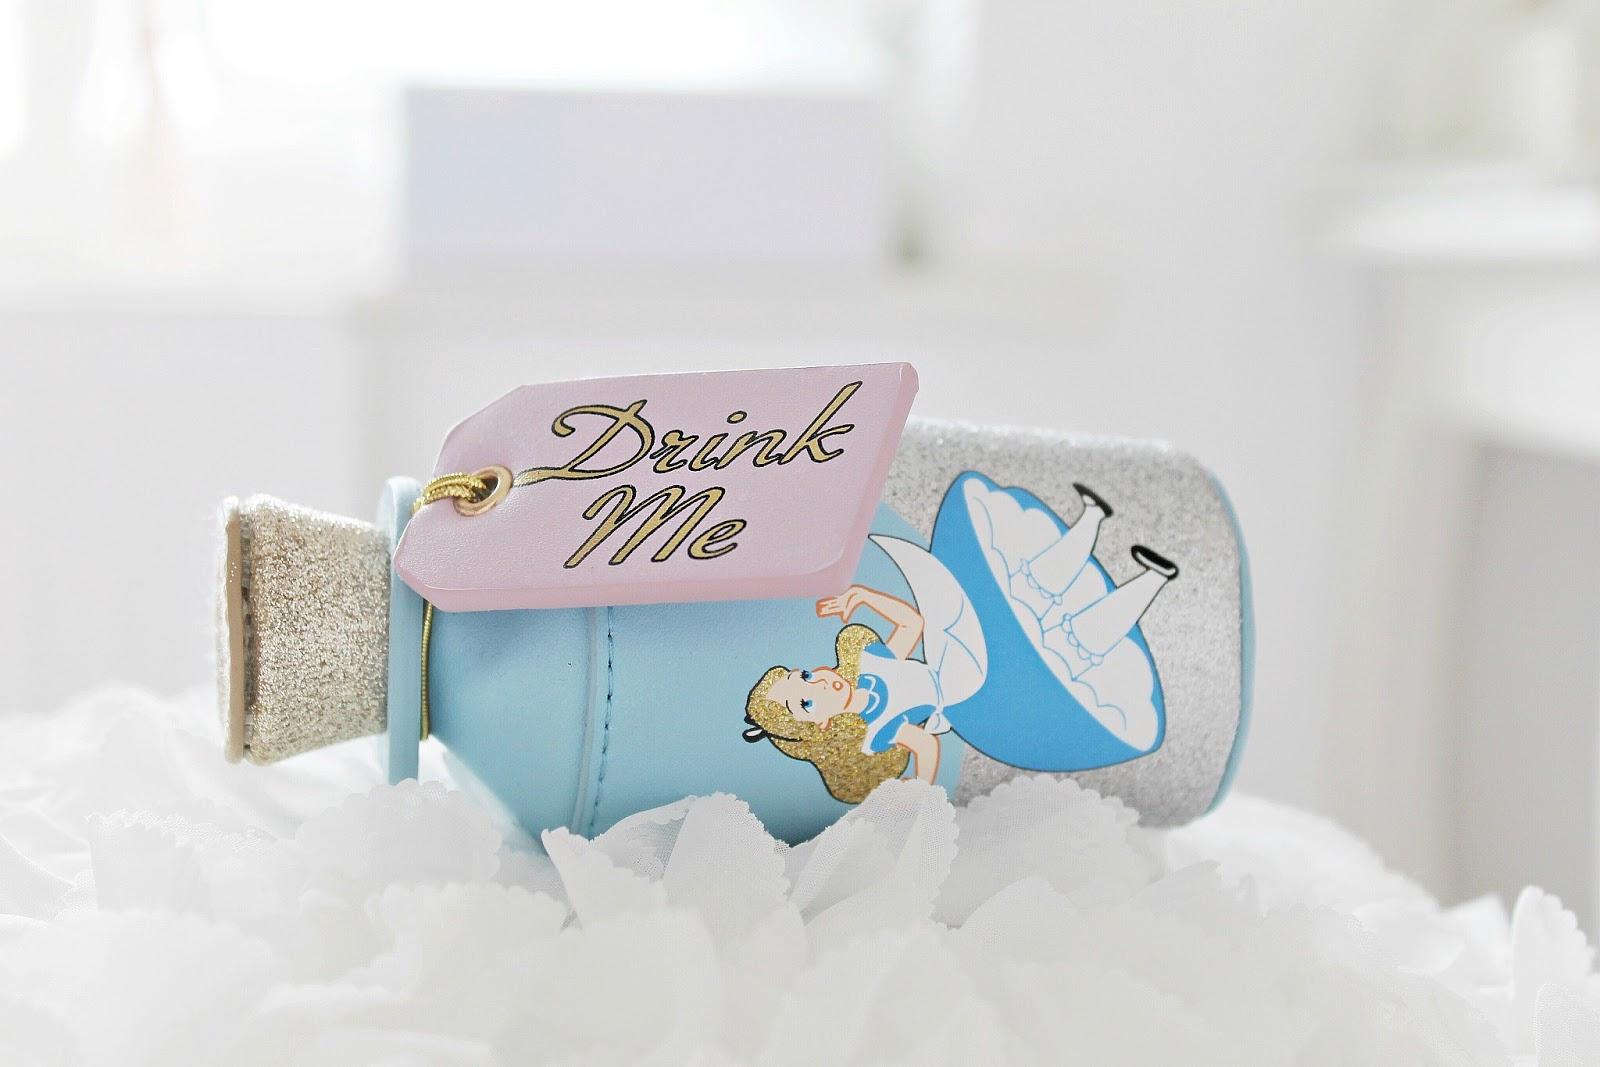 Primark Disney Alice in Wonderland collection purse